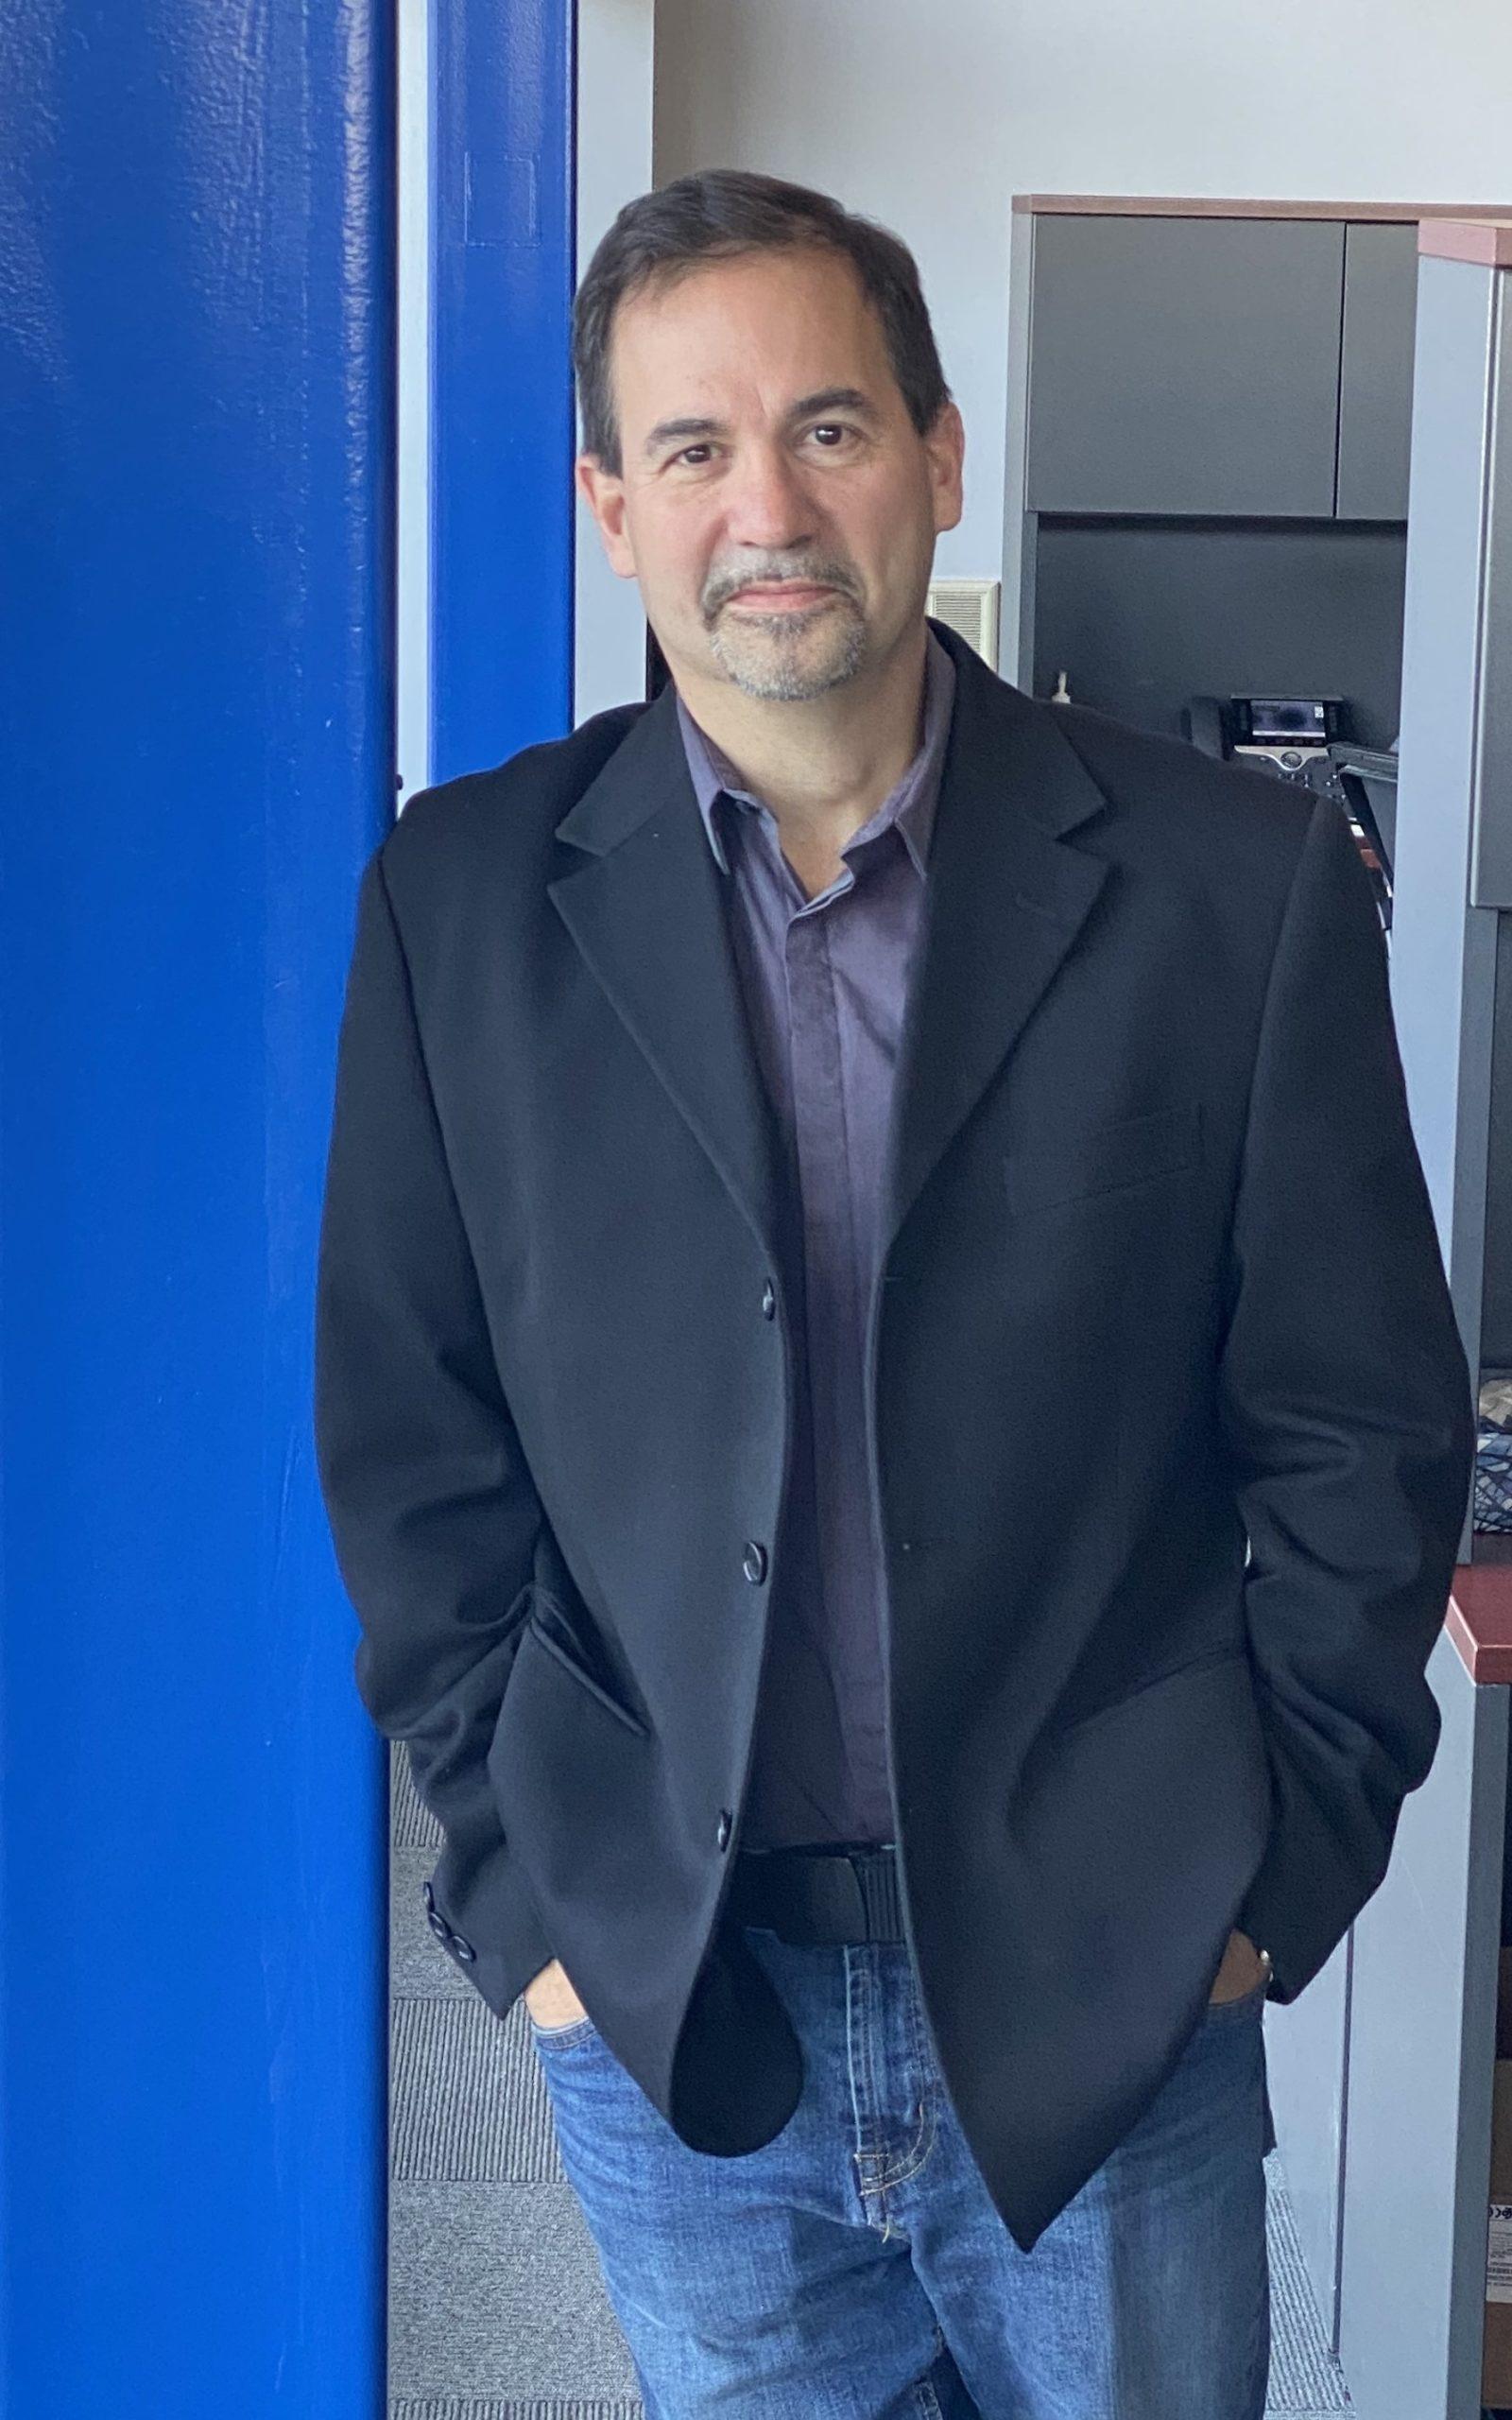 David Putnam, VP Operations